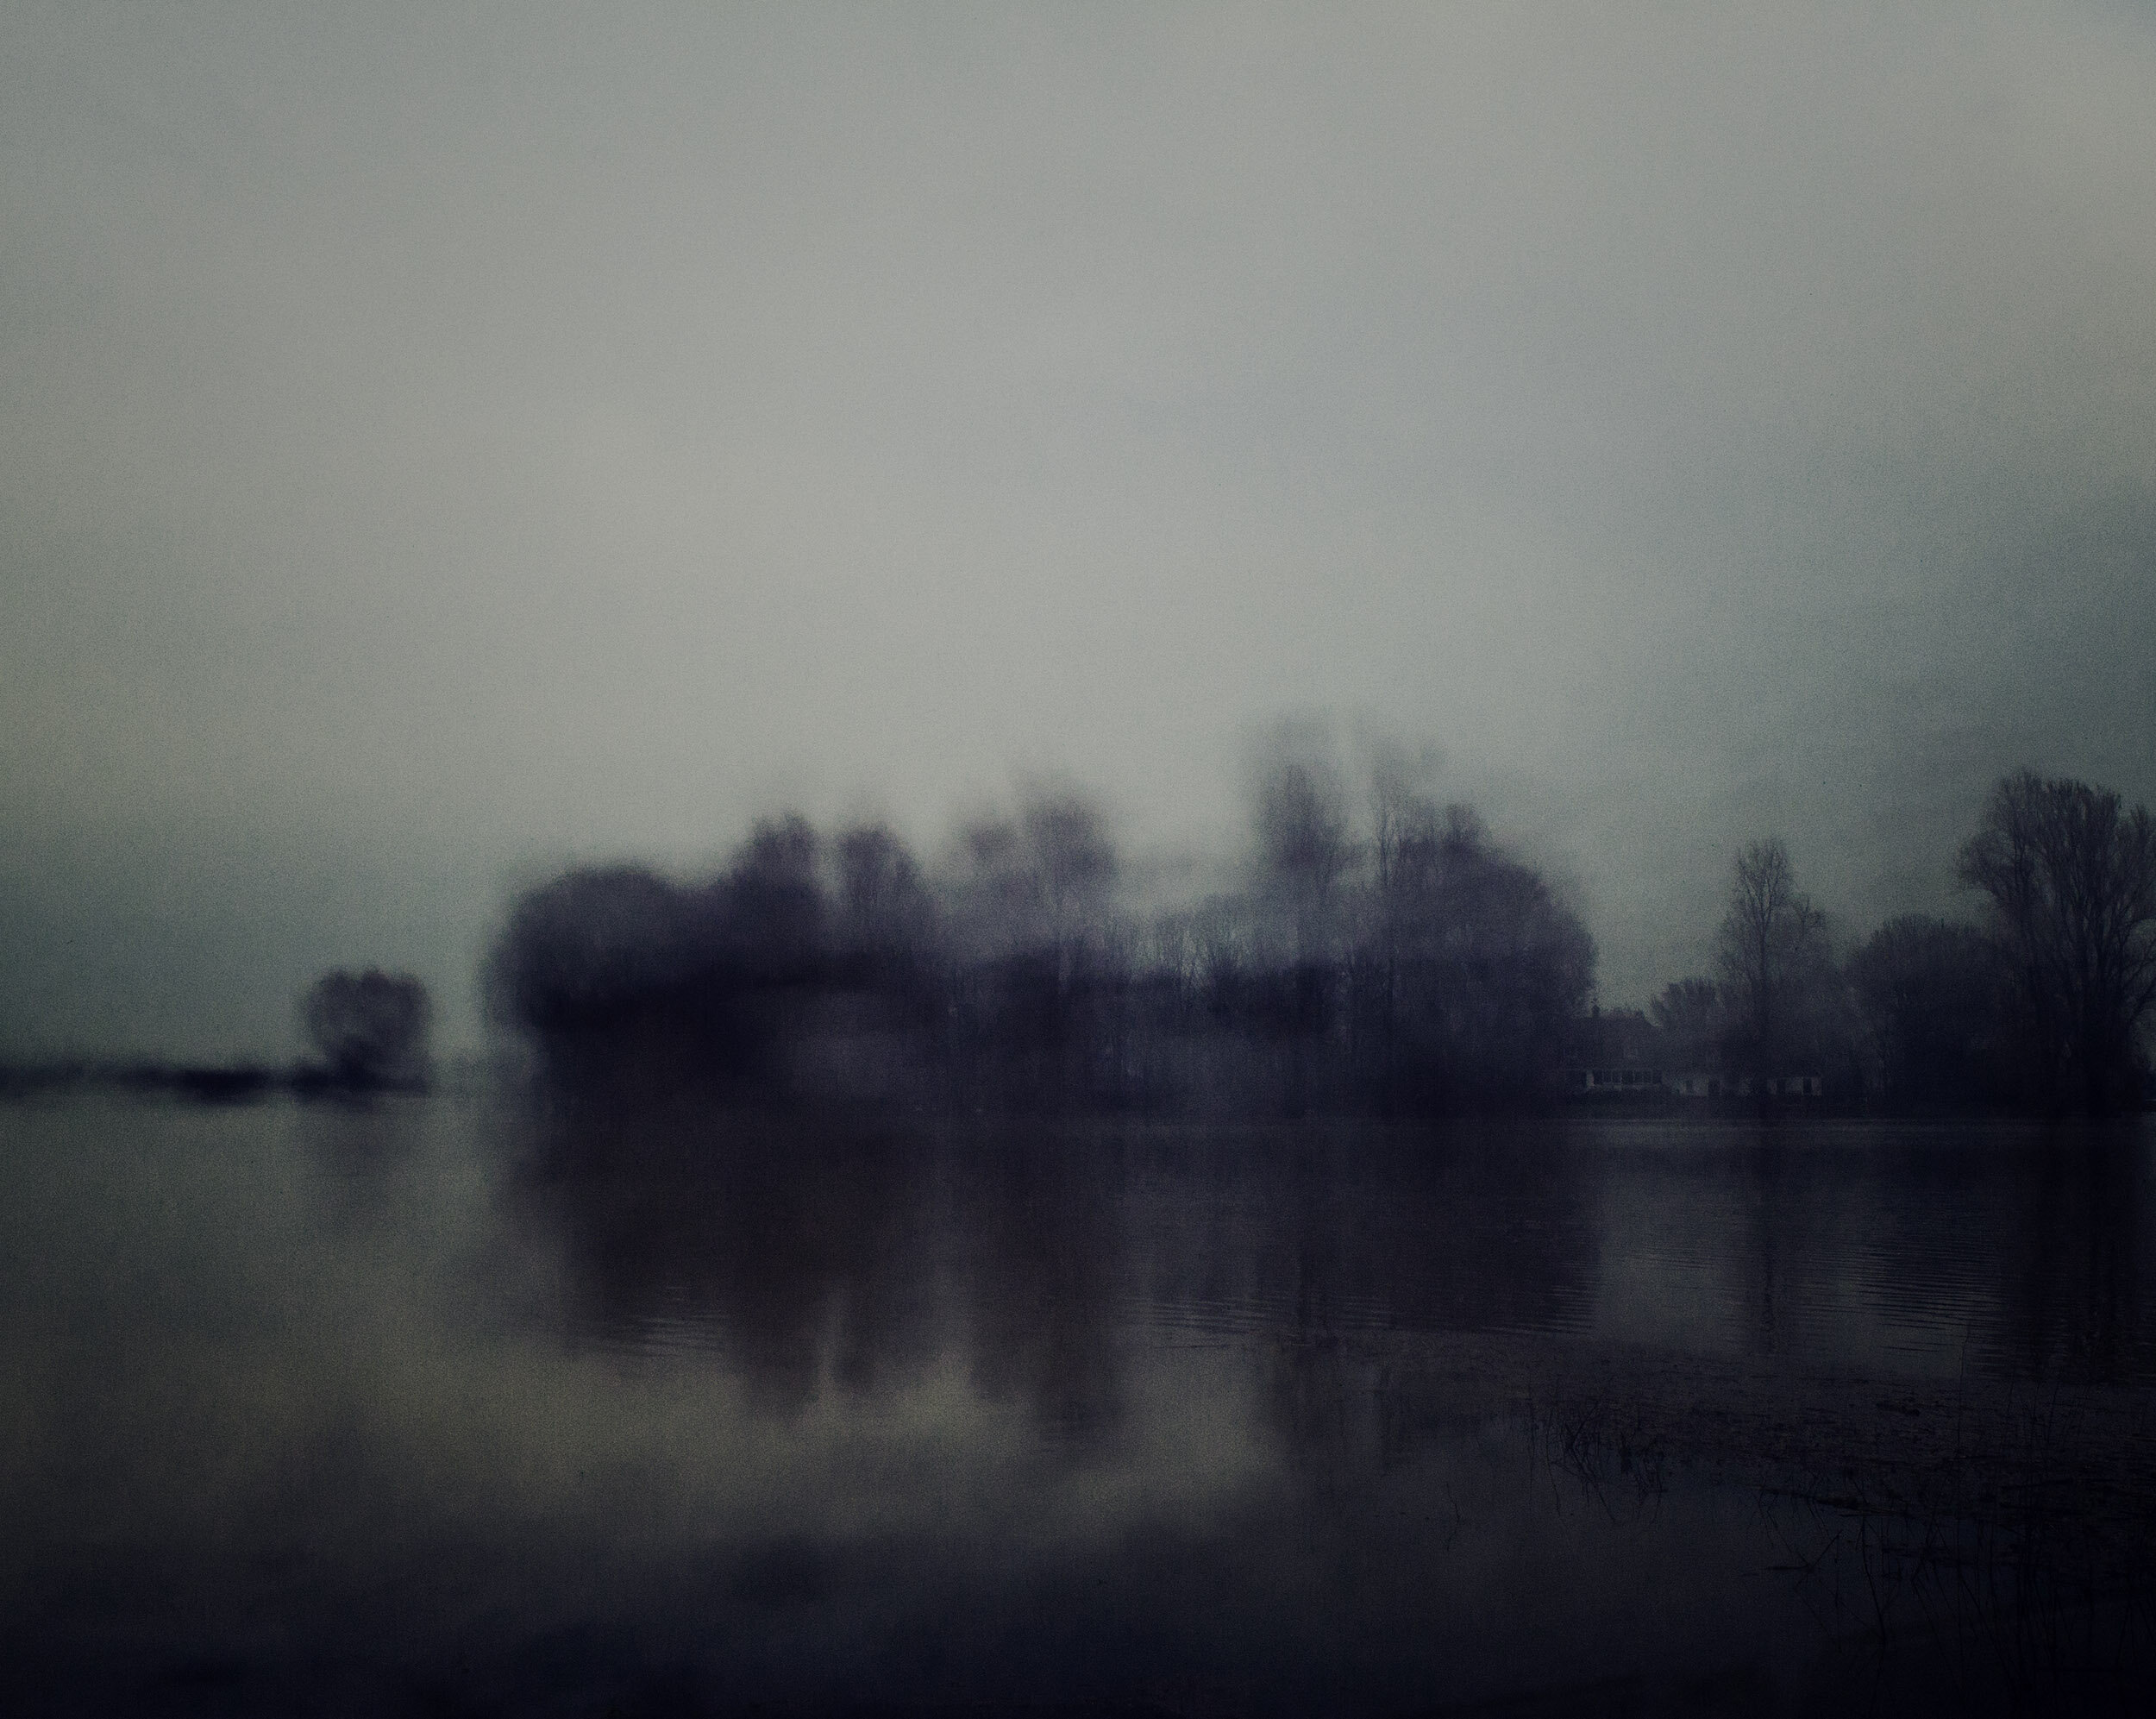 - A river flooded. Afferdense and Deestse Waarden, Deest, the Netherlands 2018